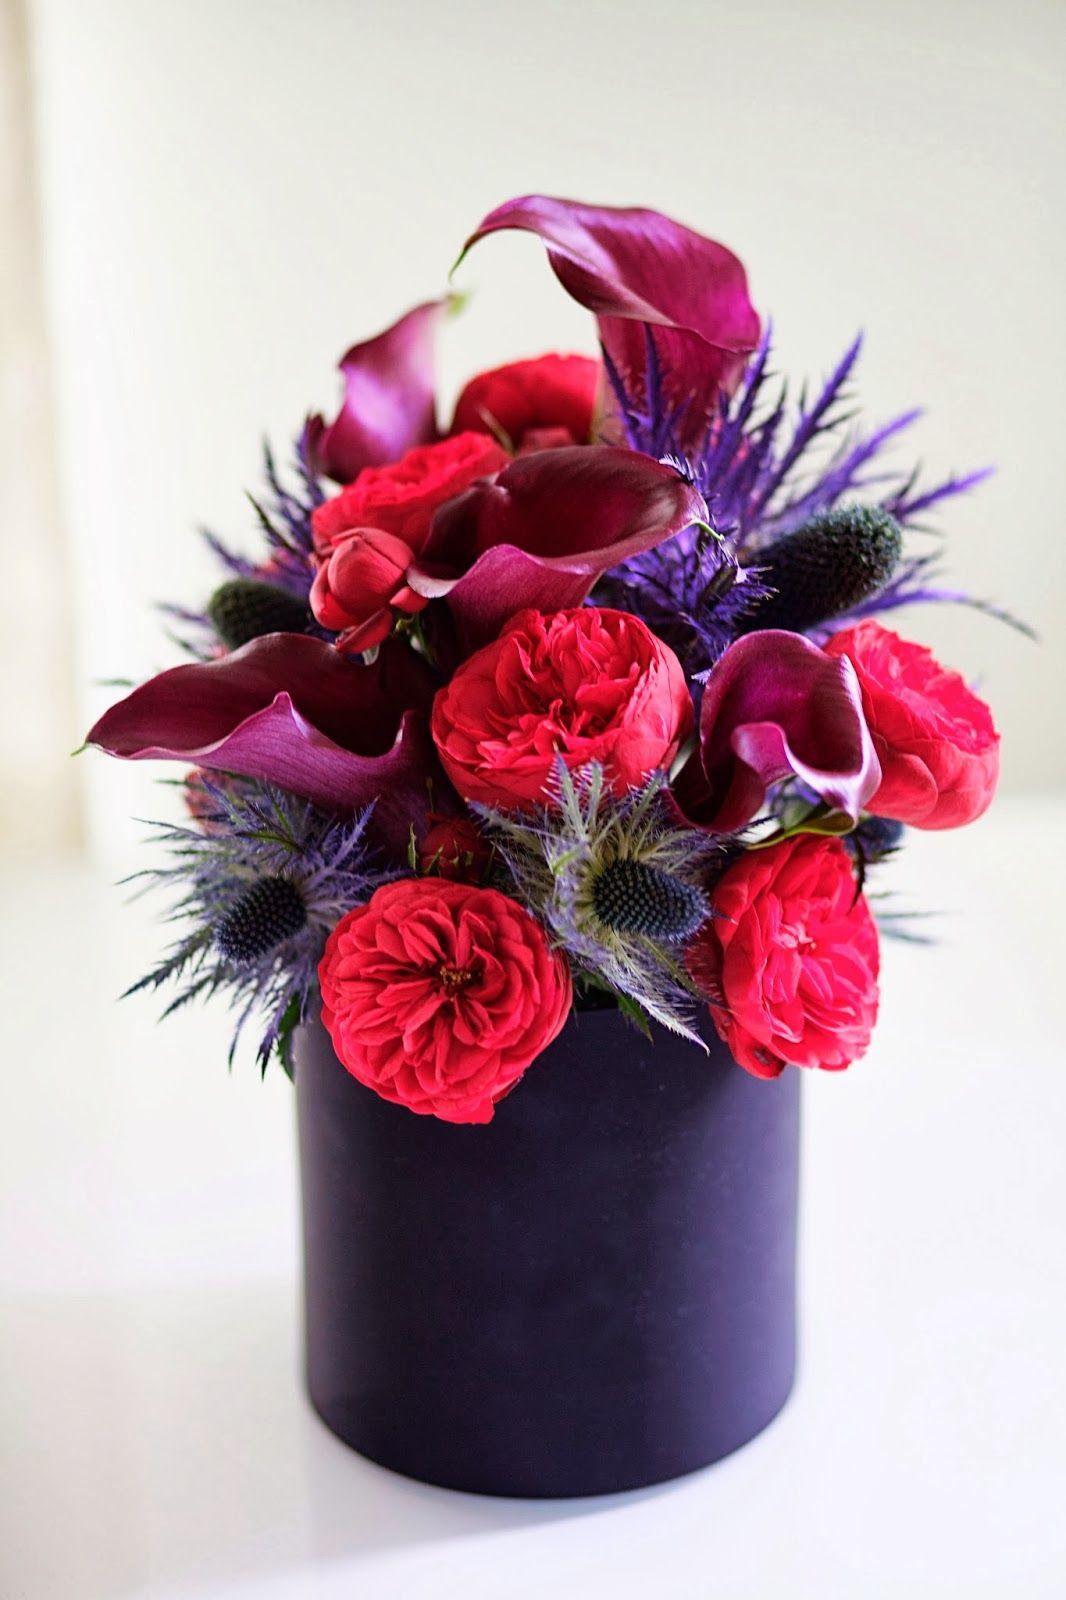 Late afternoon flower friday dream home pinterest black calla flower arrangements izmirmasajfo Choice Image